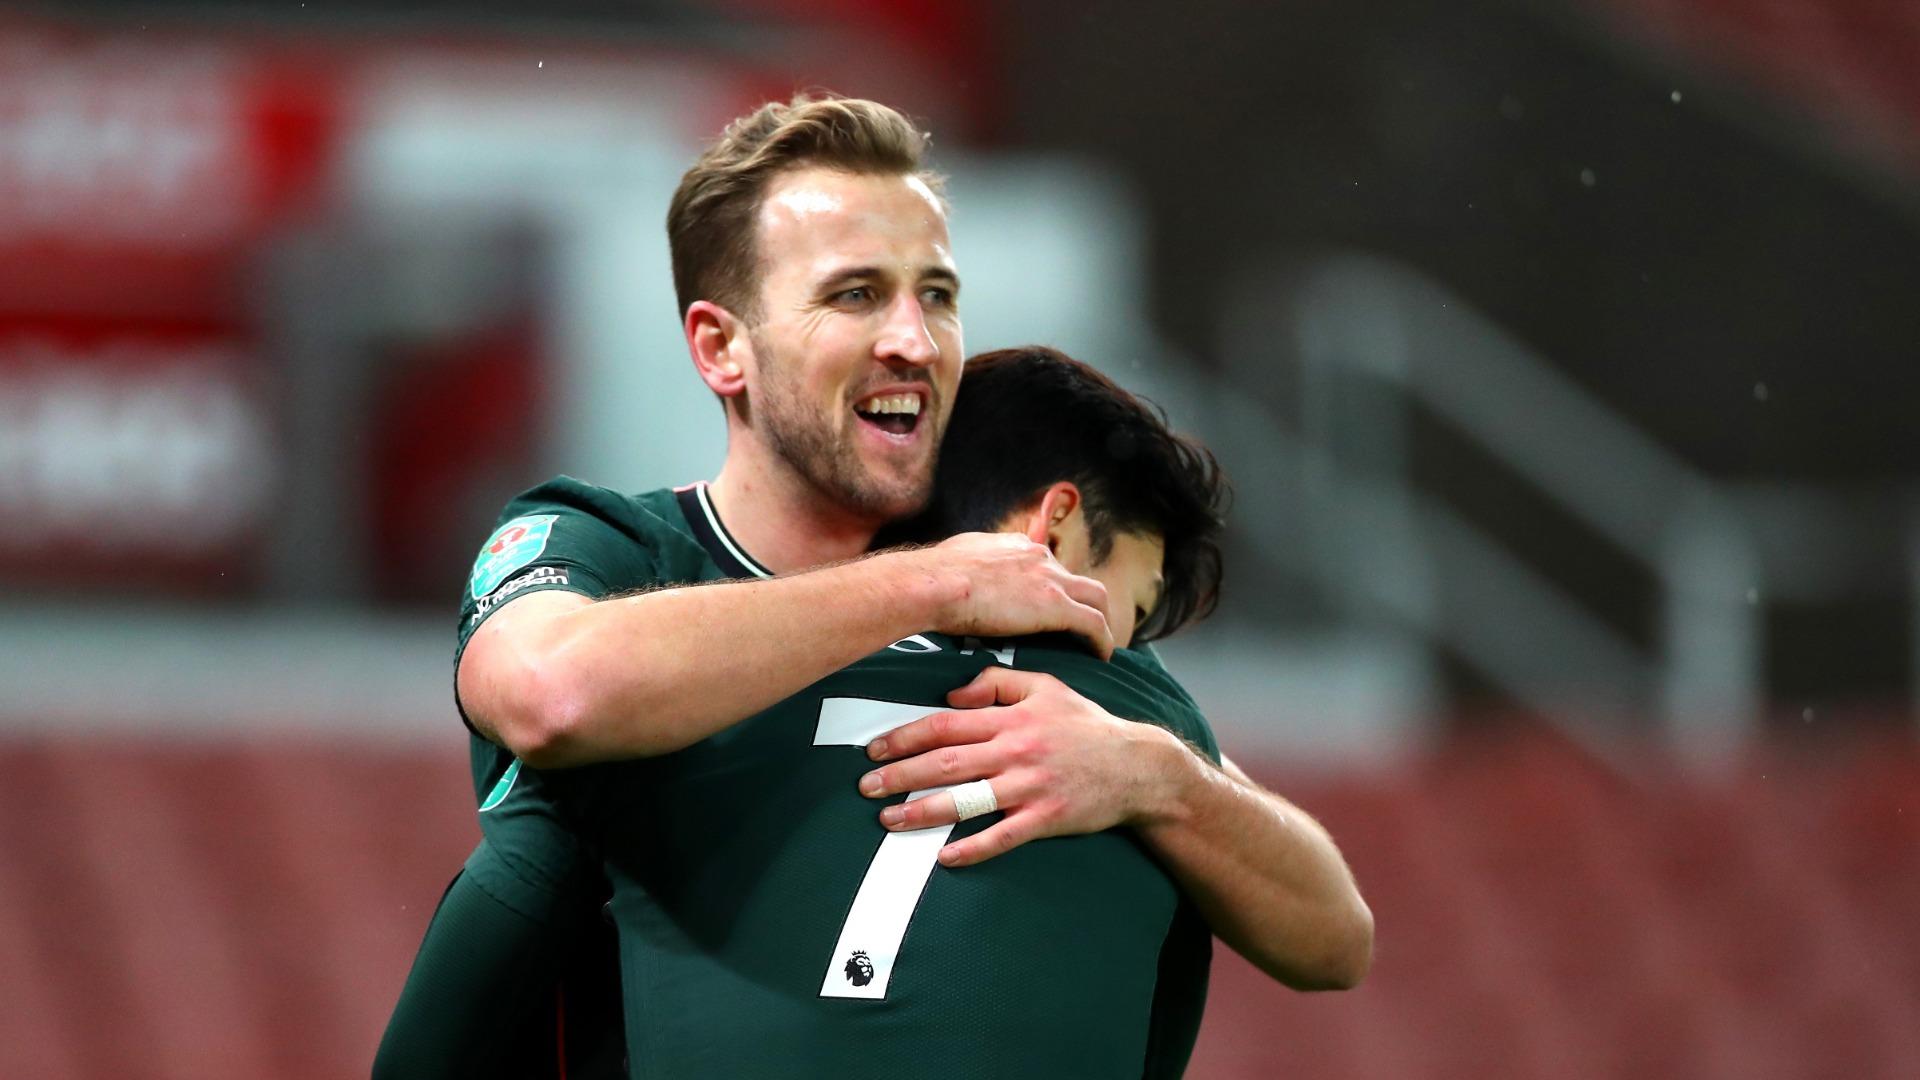 Stoke City 1-3 Tottenham: Kane on target as Spurs reach last four